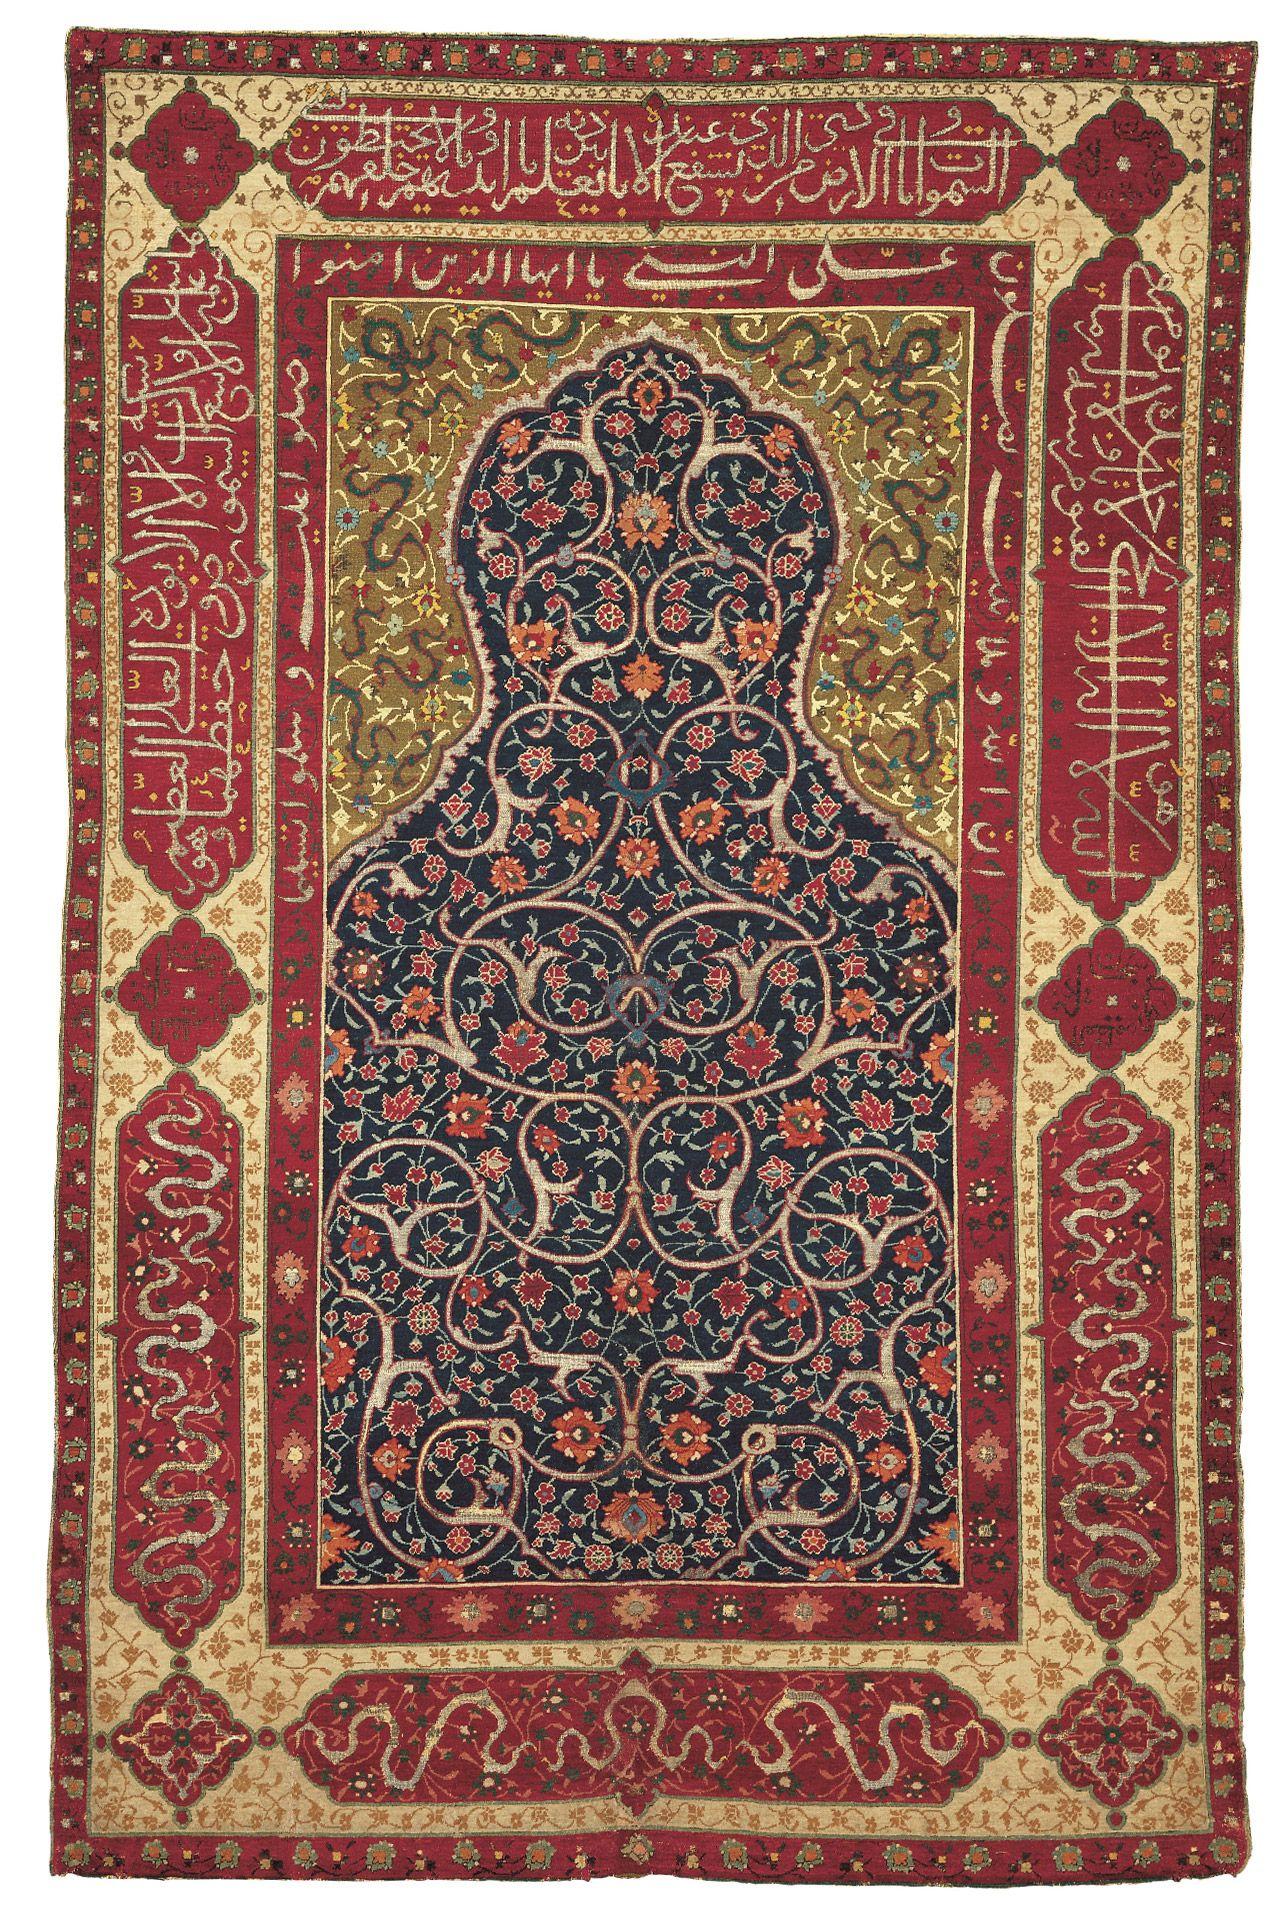 Galleria d'arte e mostra di tappeti antichi orientali